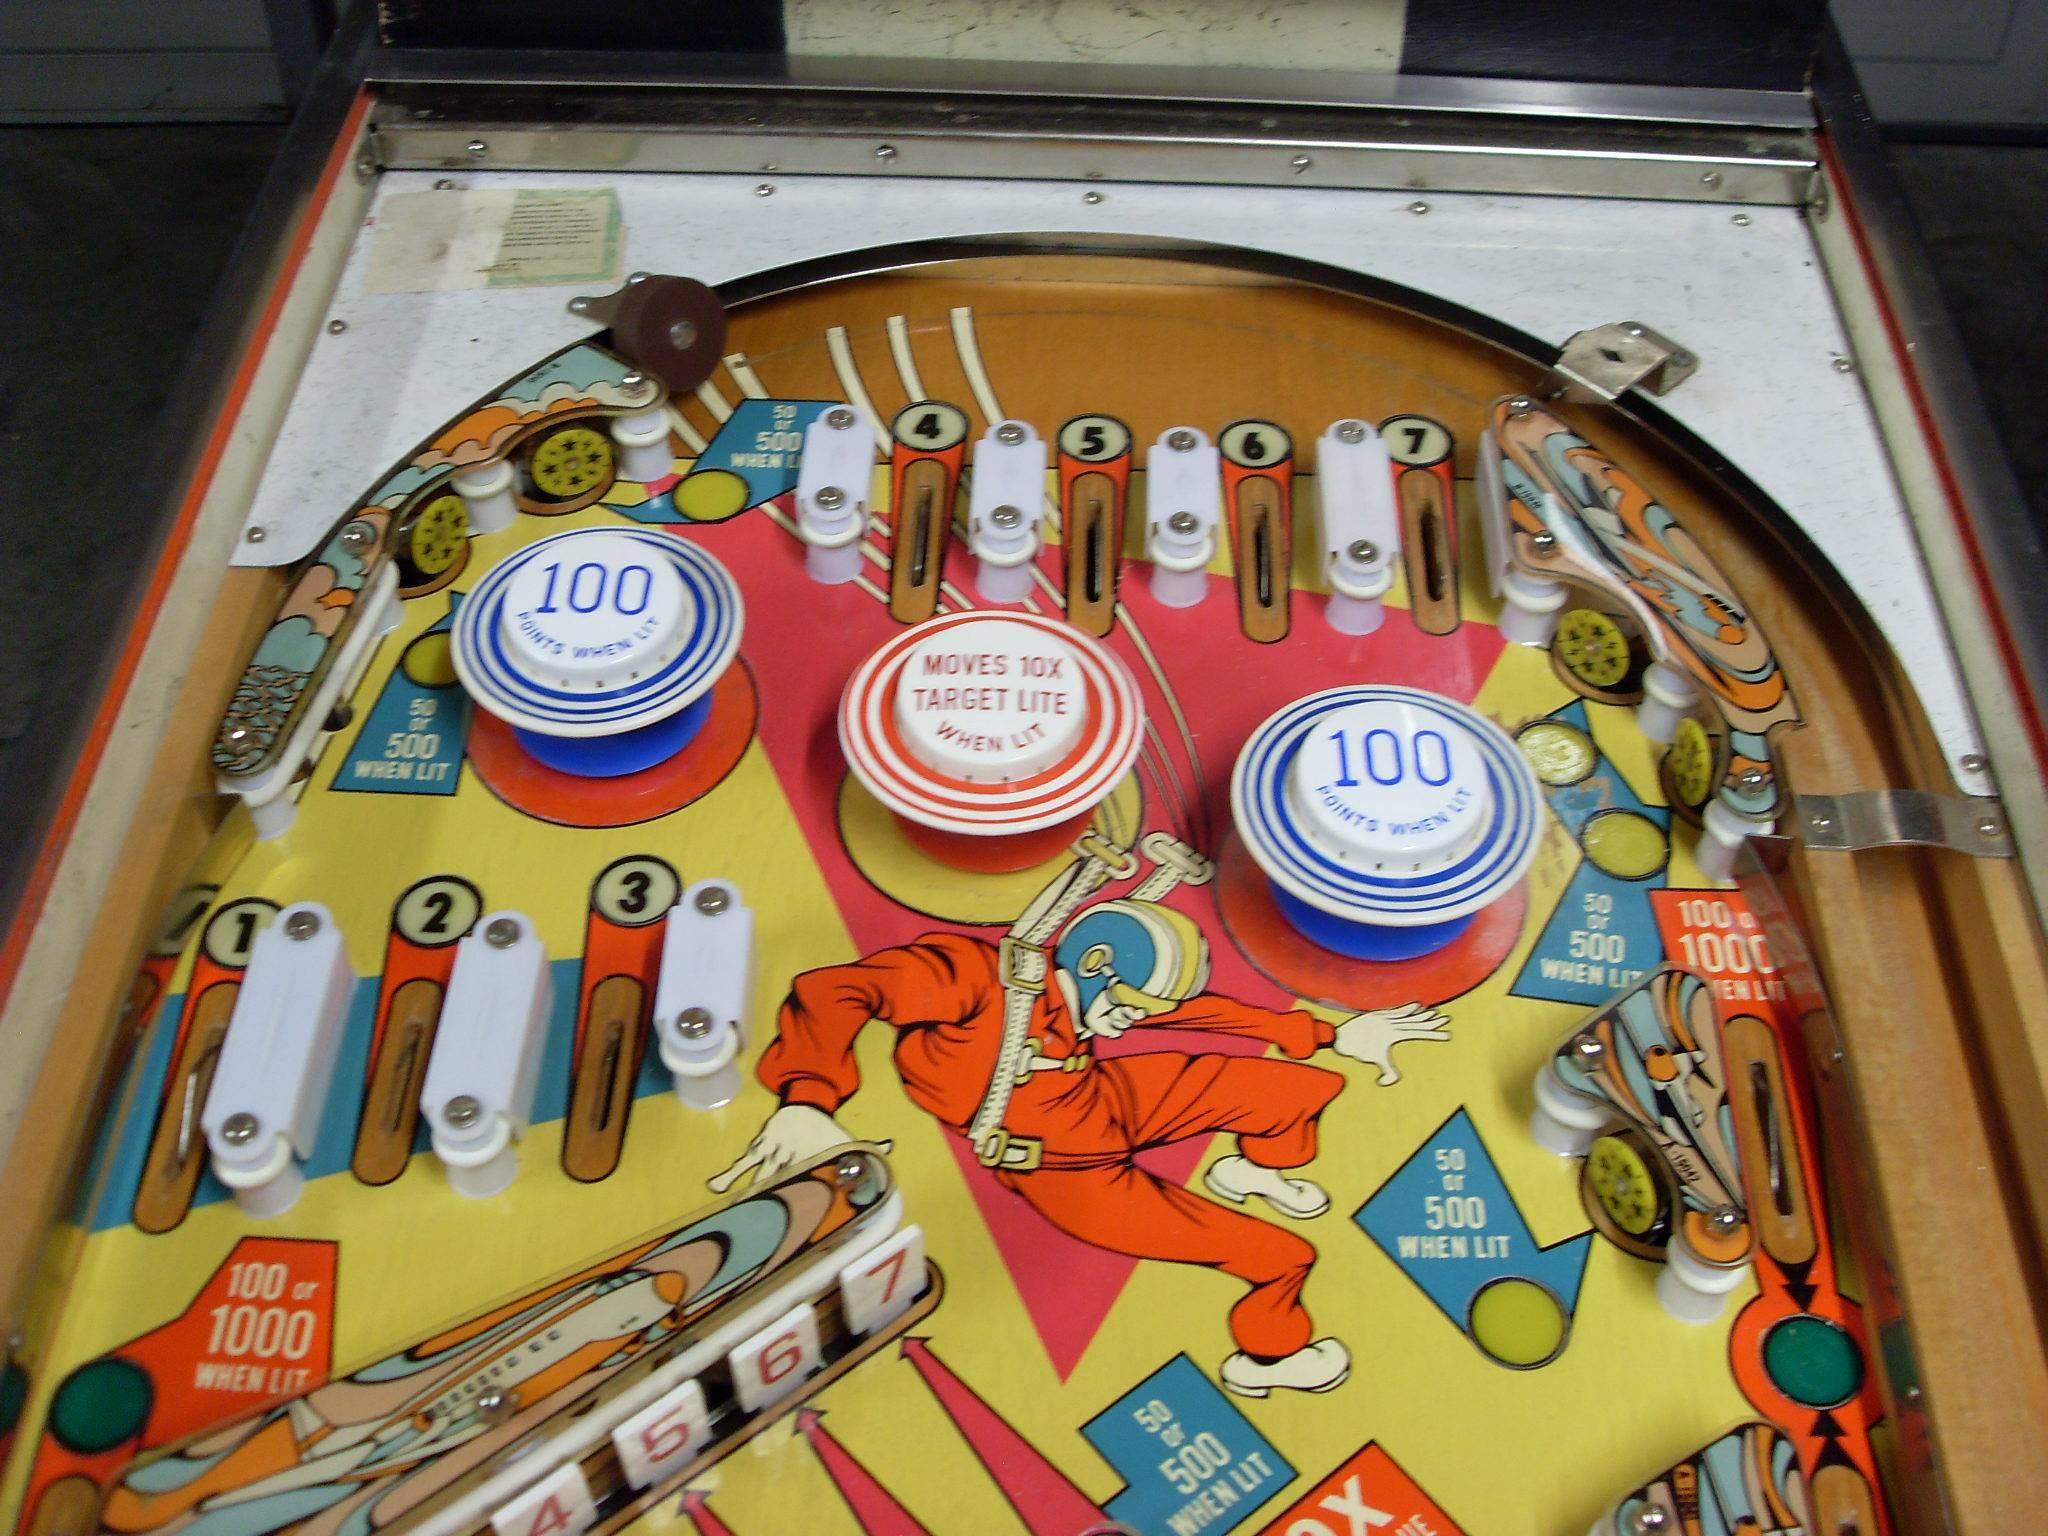 Sky Jump Pinball Machine Gottlieb 1974 Image Gallery Pinside